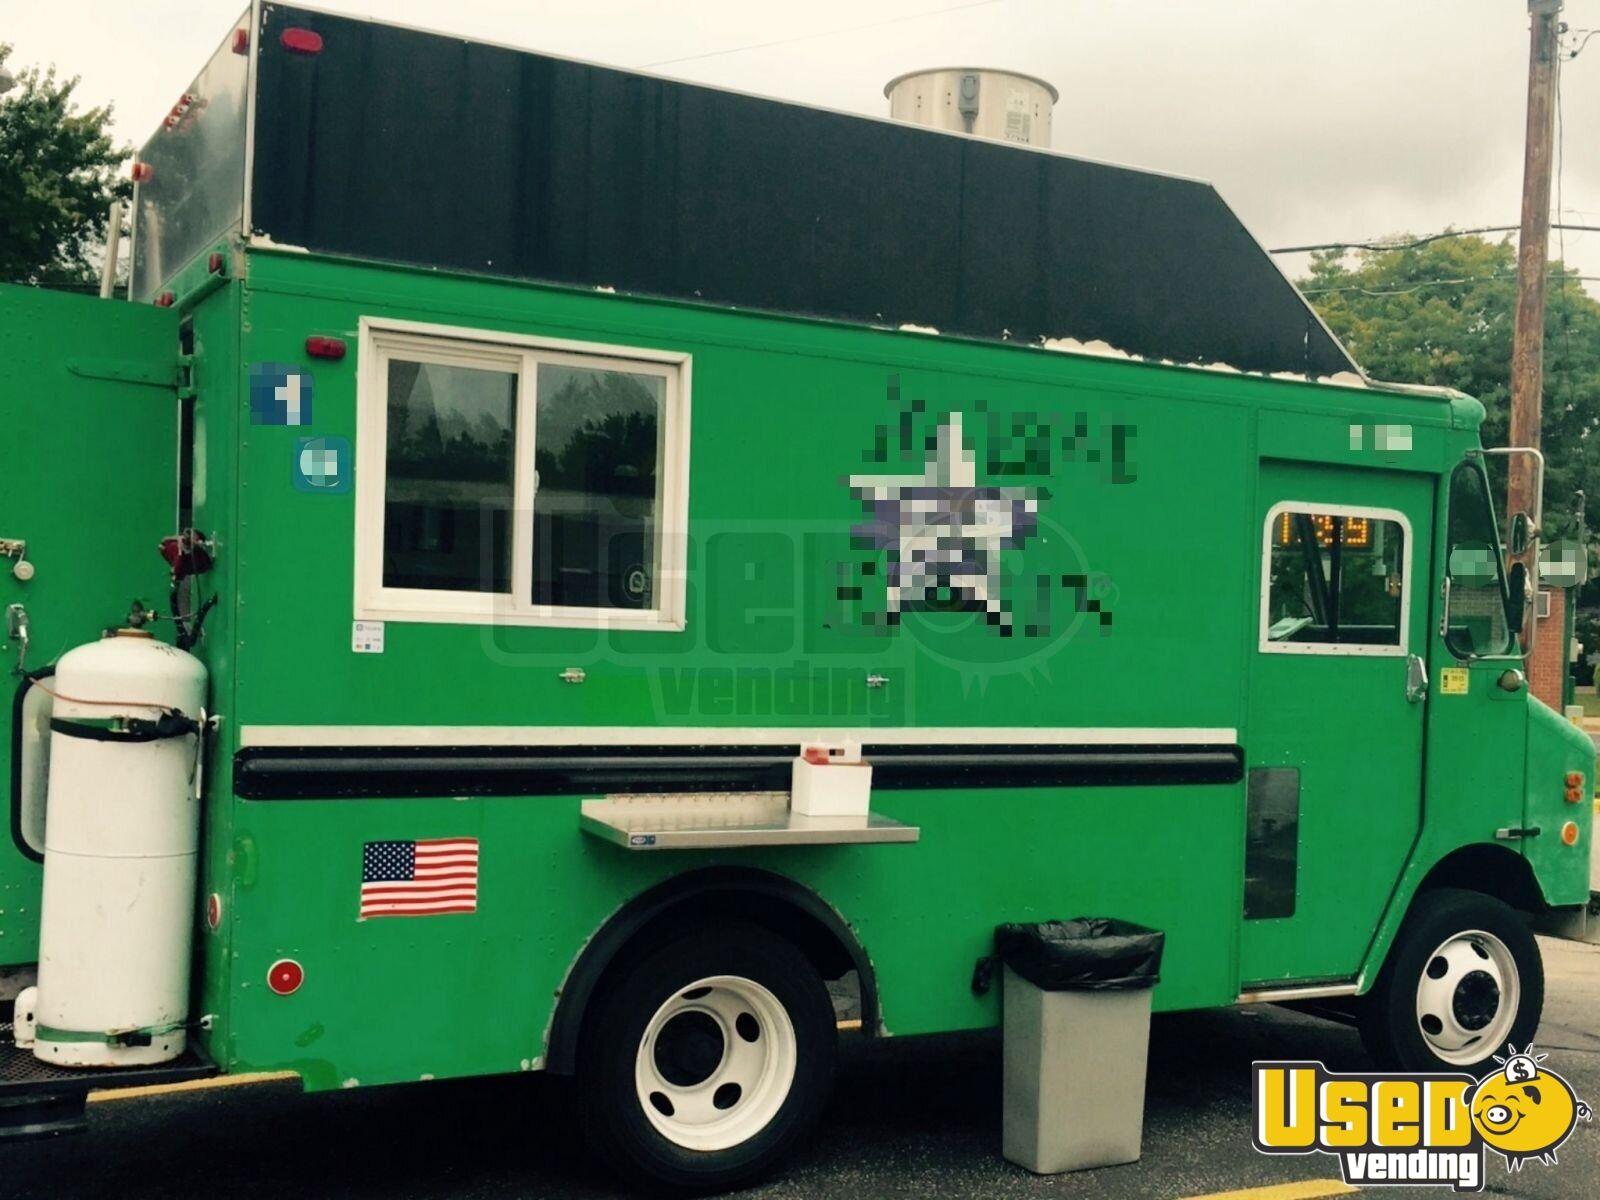 Trucks For Sale Mn >> Chevrolet Mobile Kitchen Food Truck For Sale In Minnesota